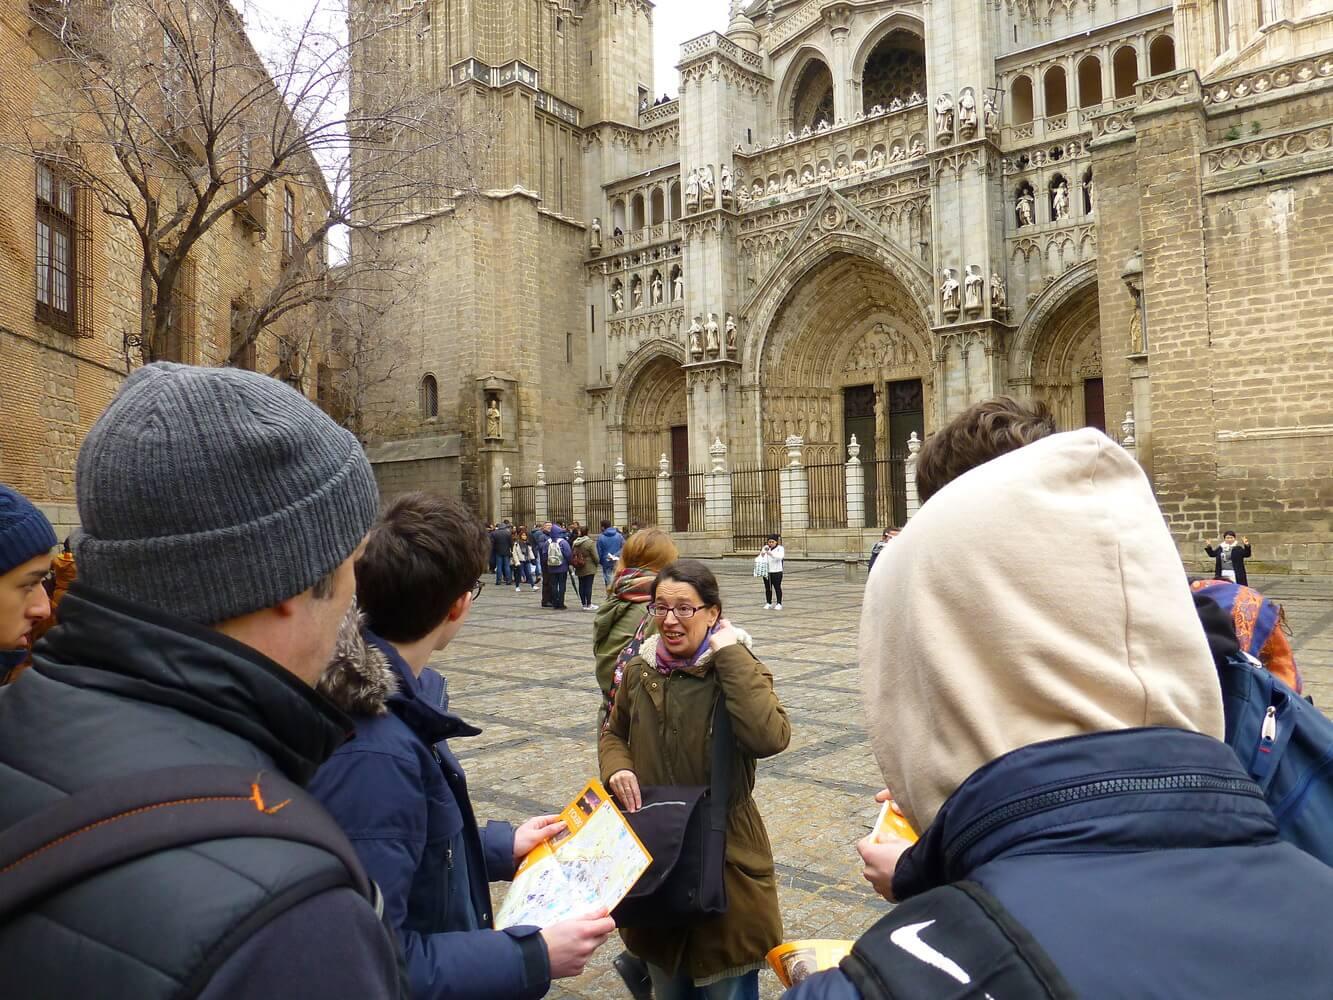 Visit of students of Manchester Grammar School, Tourism in Toledo